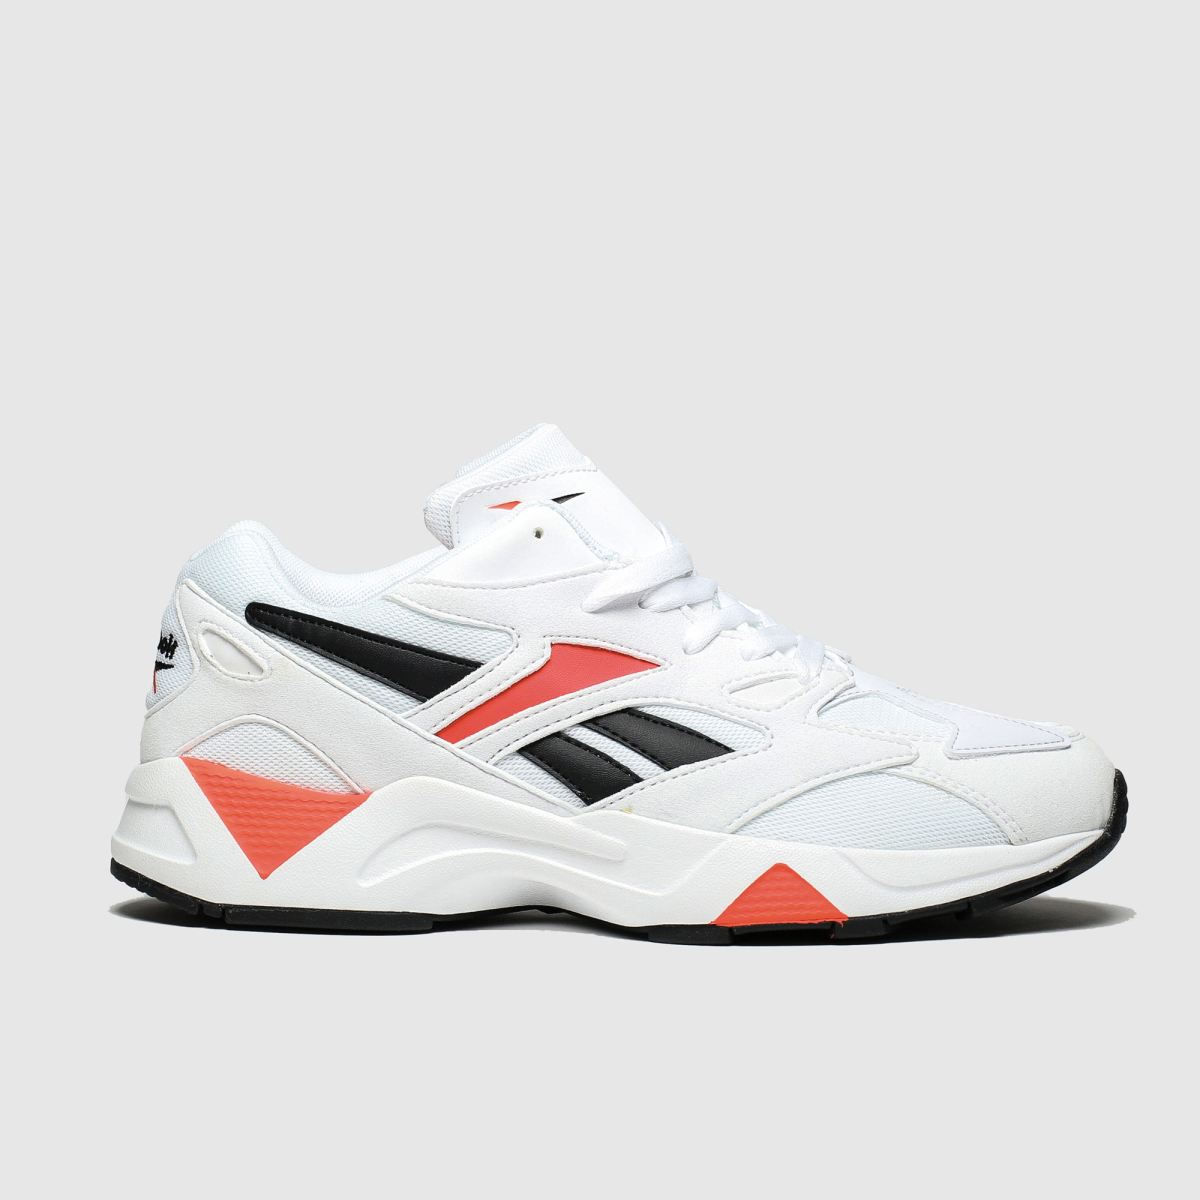 Reebok White & Red Aztrek 96 Reinvented Trainers